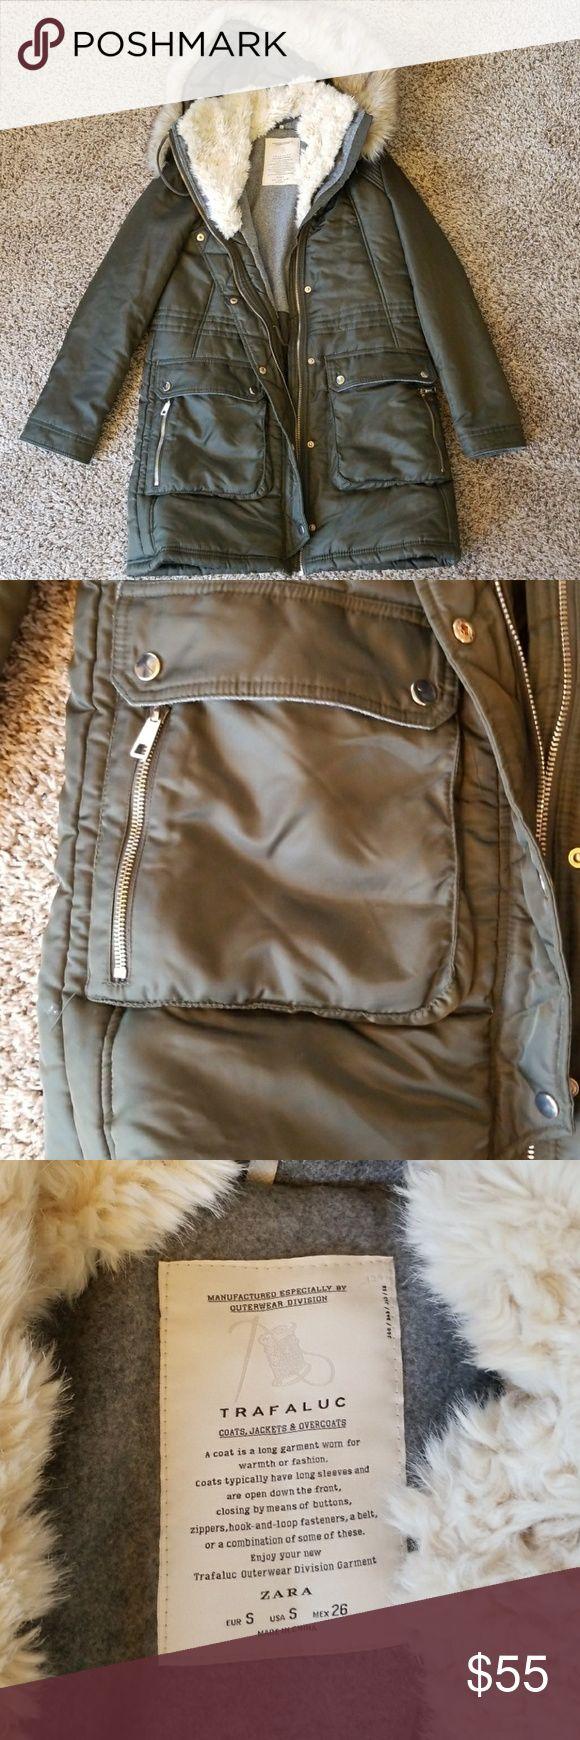 Zara Winter Jacket Khaki/Green. Like new. Size small fits a mediun as well. Faux fur hoodie, shearling trim around collar. Zara Jackets & Coats Puffers